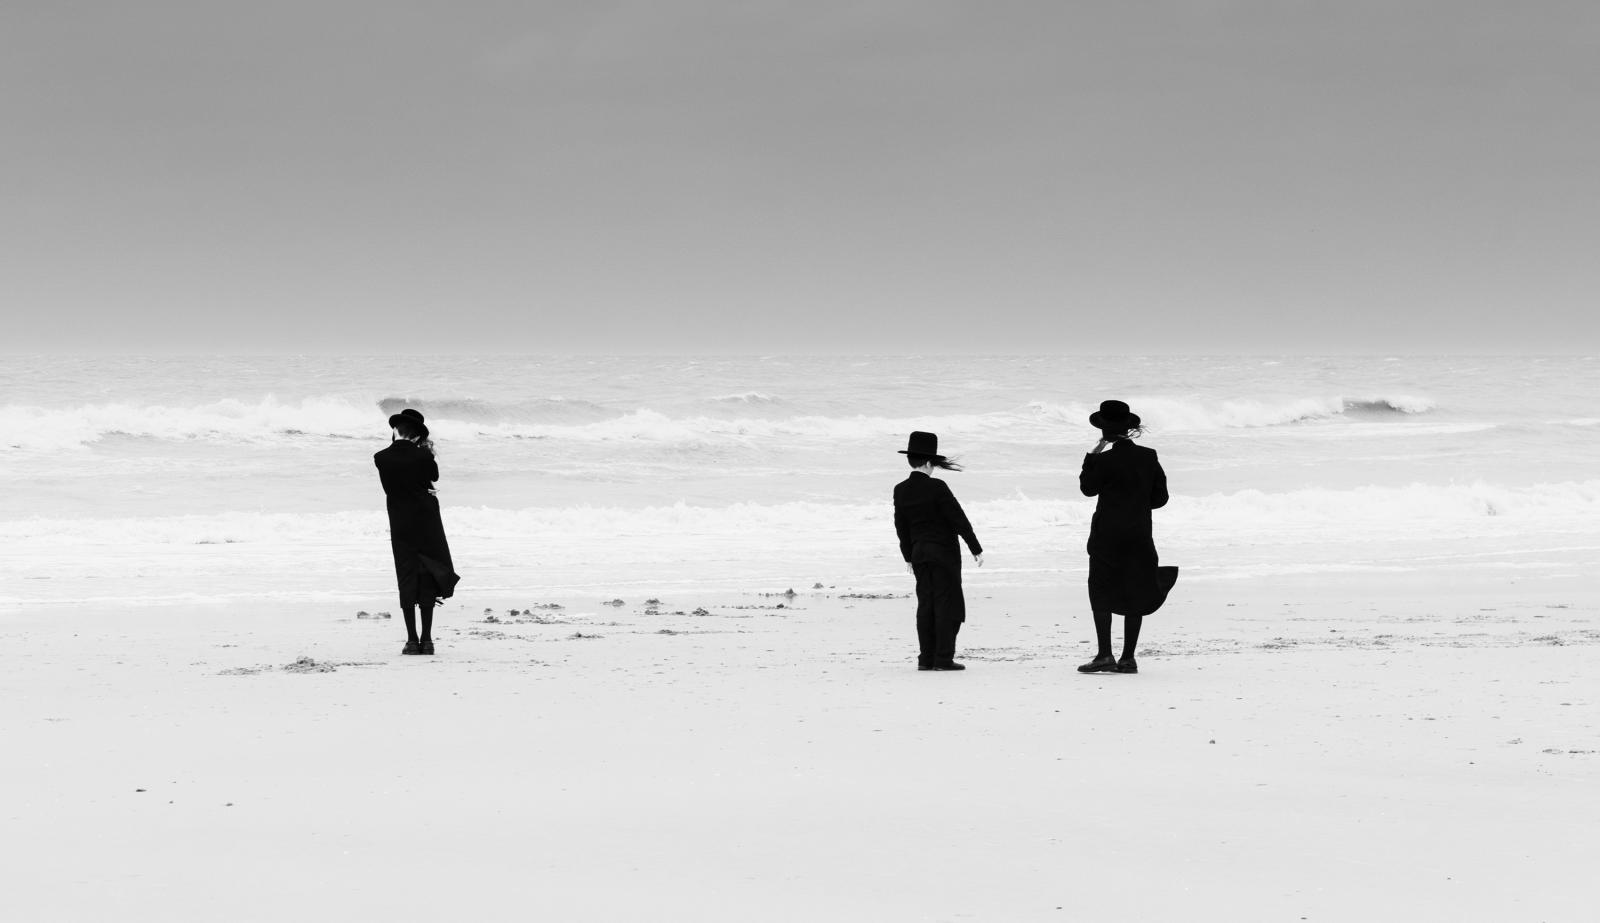 Photography image - Loading 03.Eddy_Verloes_Zen_at_sea.jpg